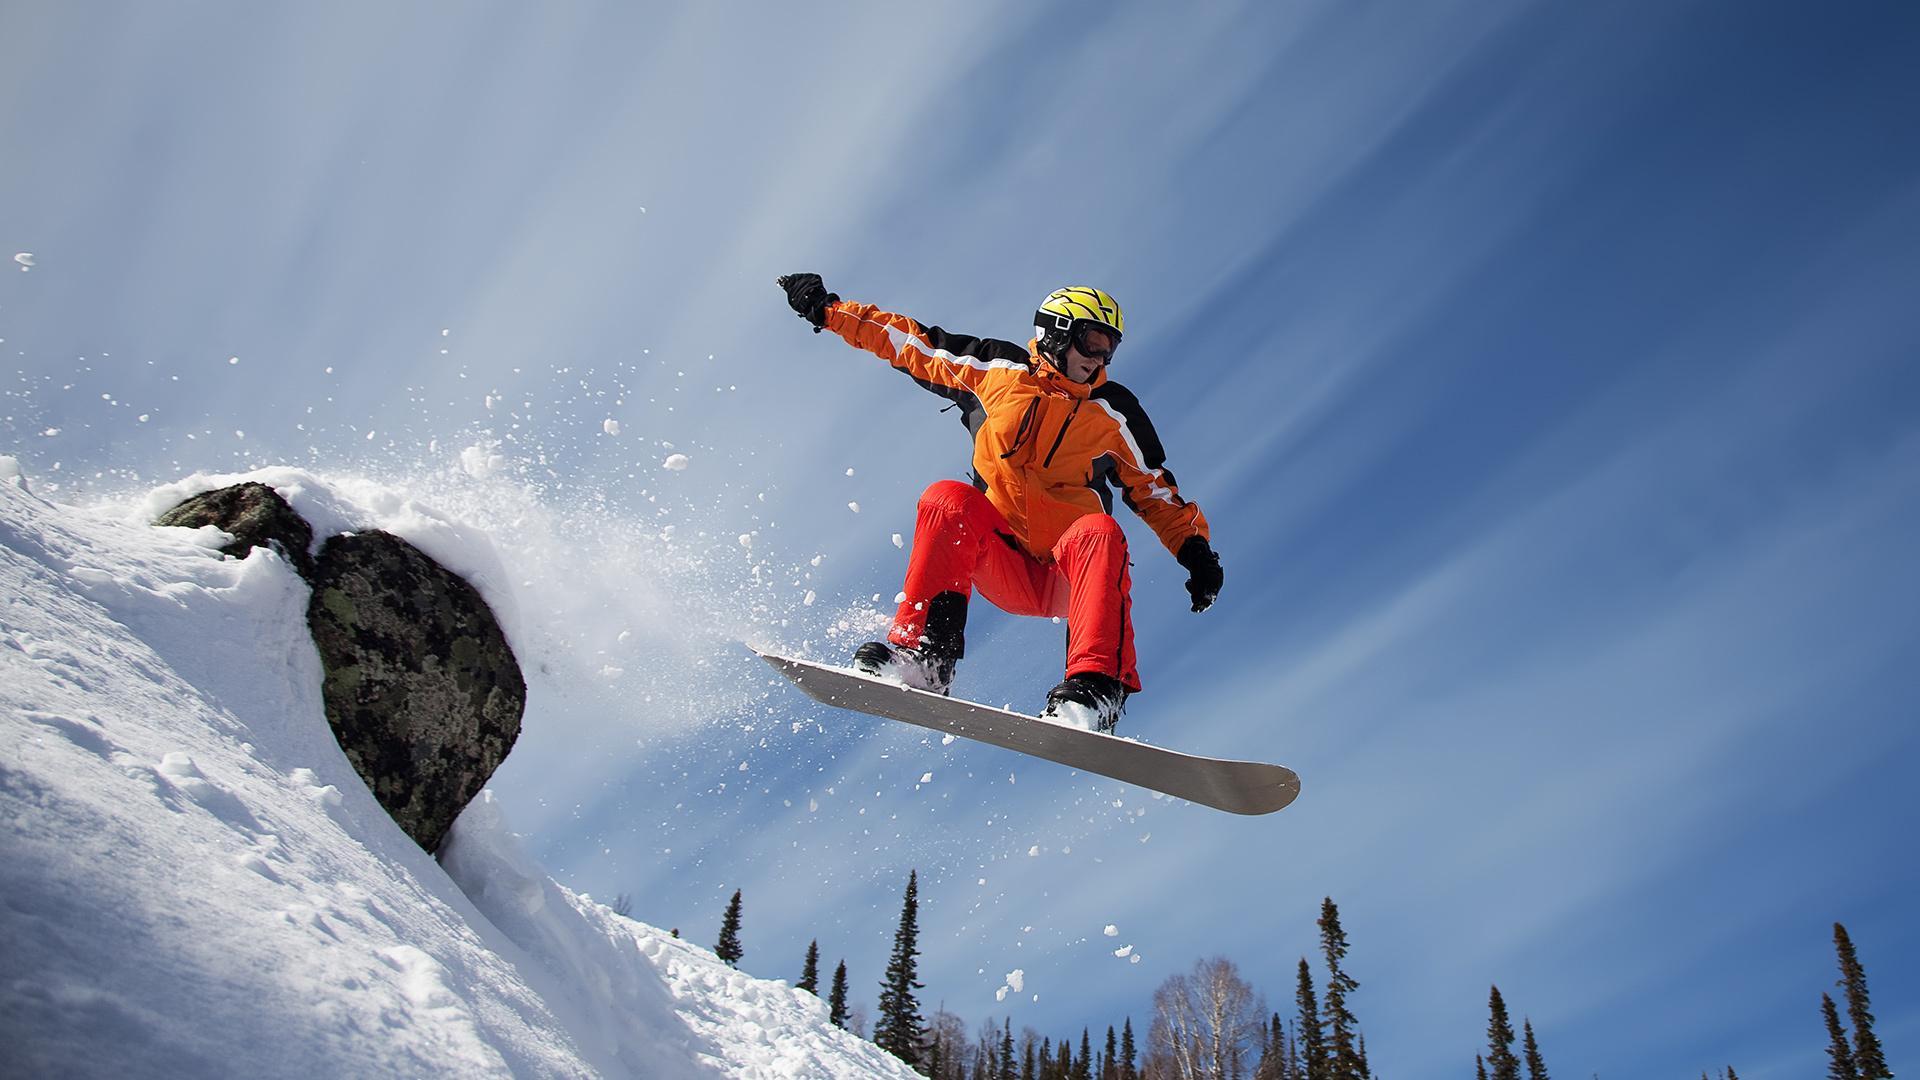 Симулятор катания на сноуборде скачать